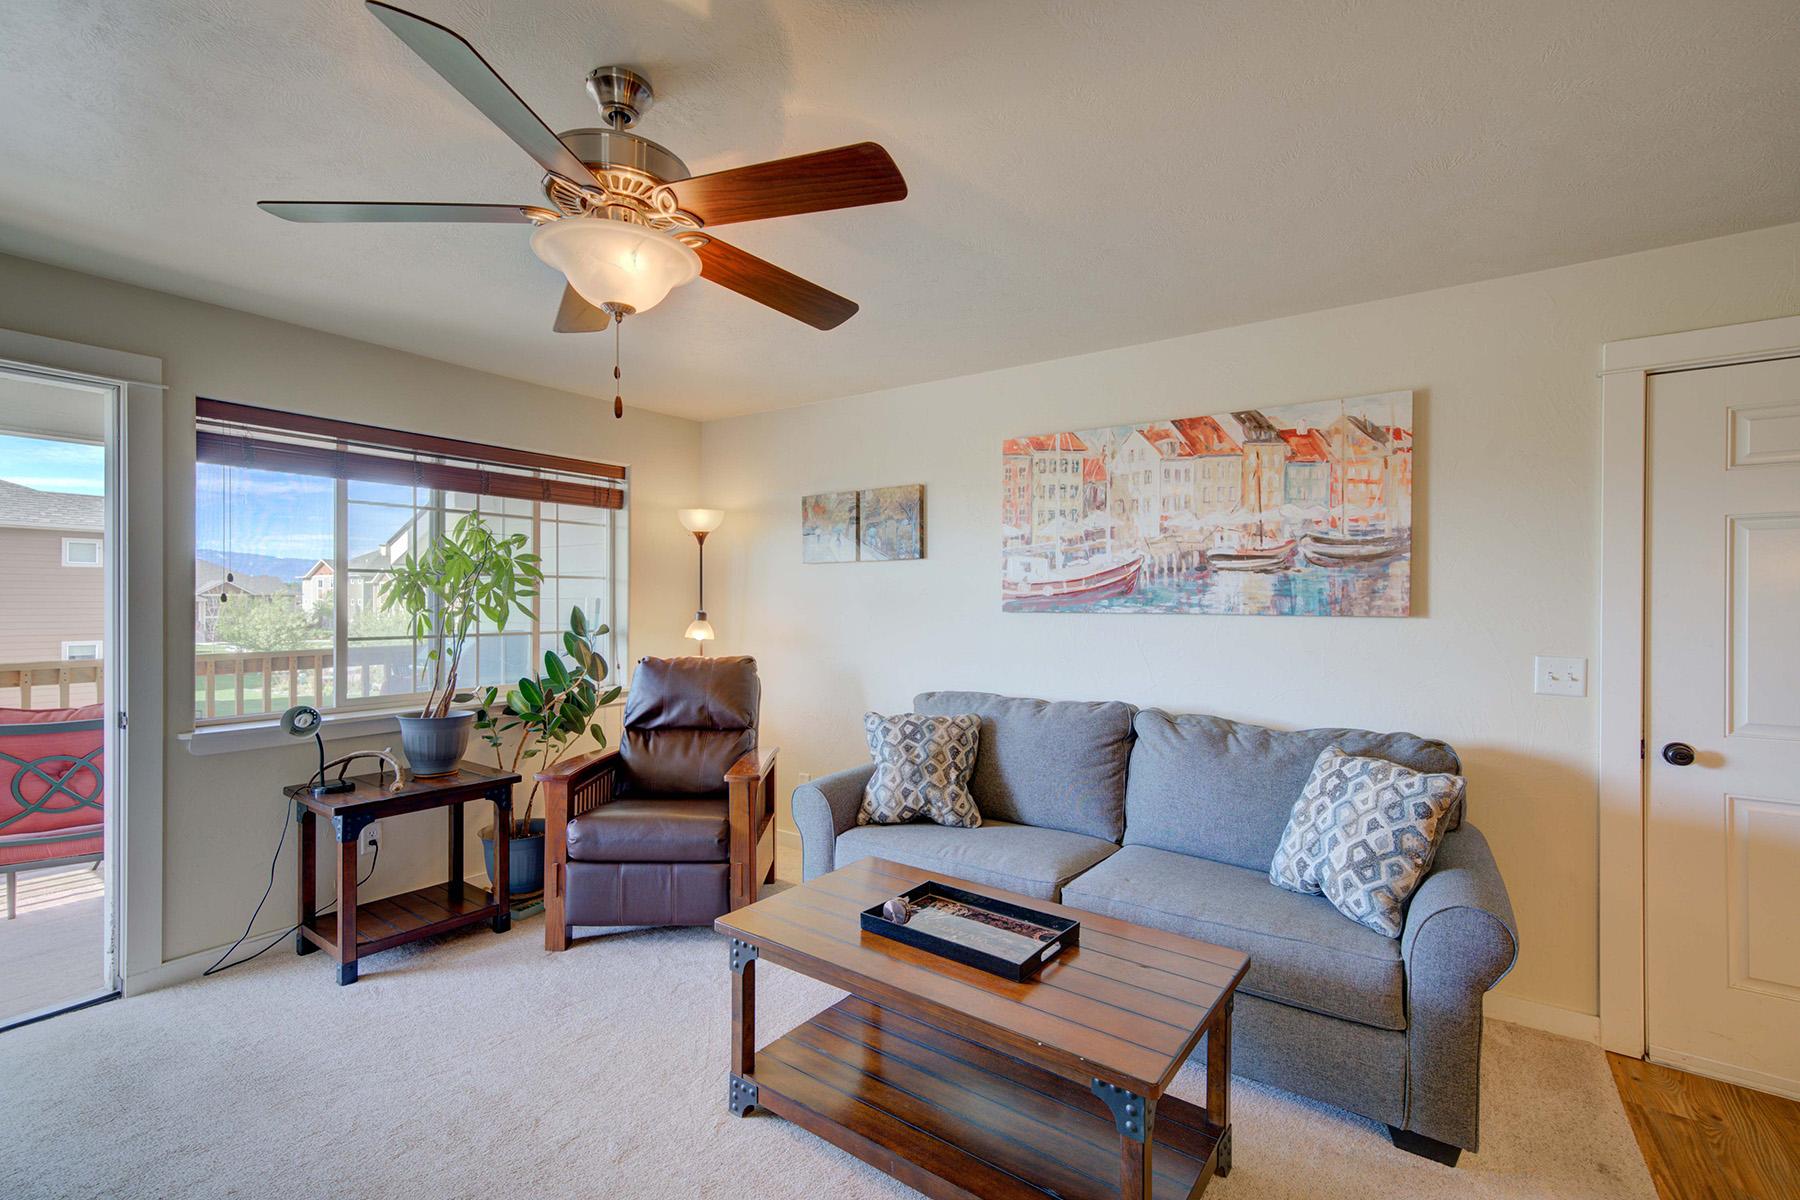 Condominiums for Sale at 2220 Baxter Lane Unit 12 Bozeman, Montana 59718 United States